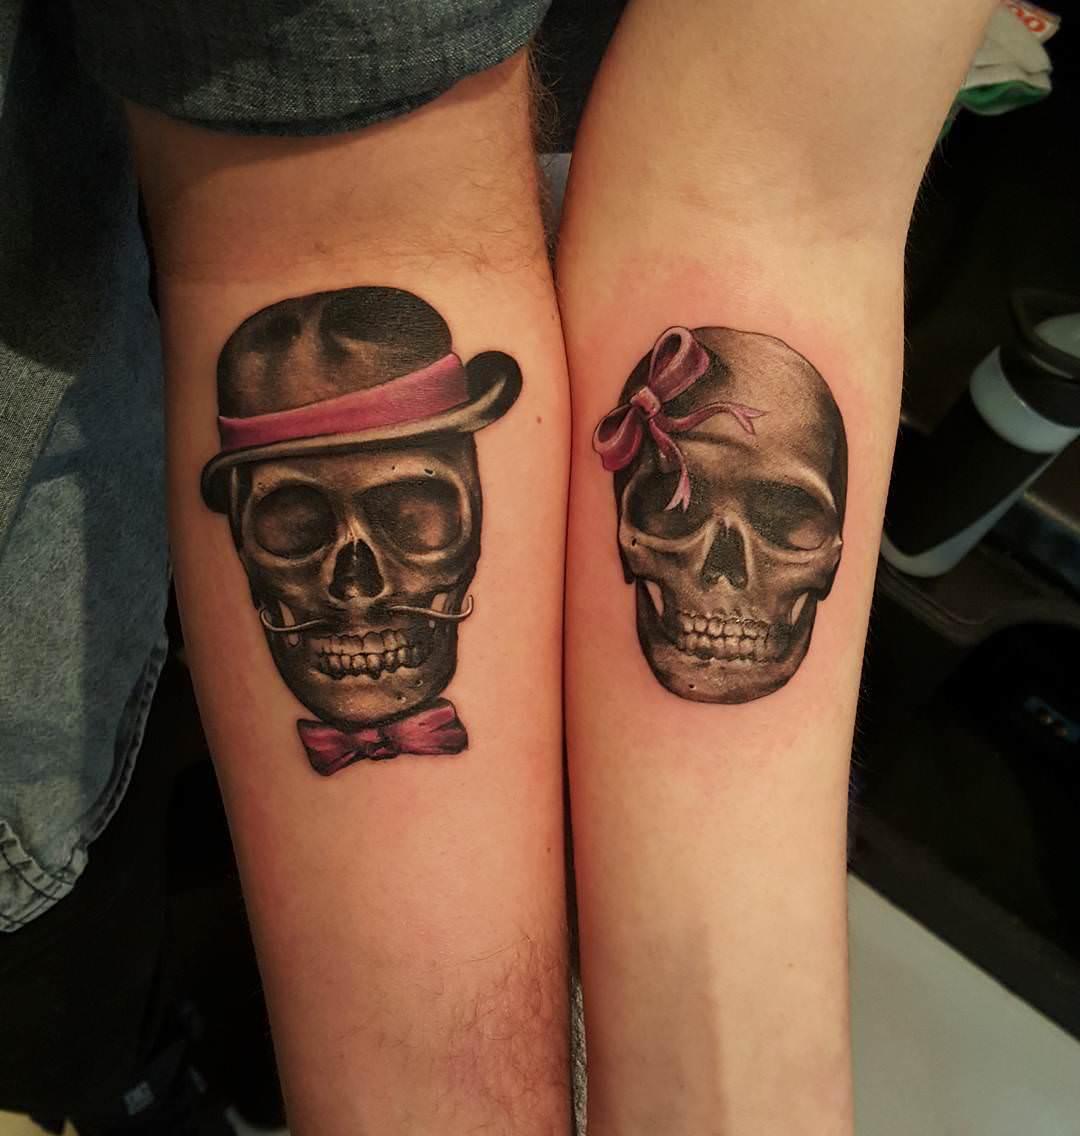 25 Interlocking Tattoo Designs Ideas Design Trends